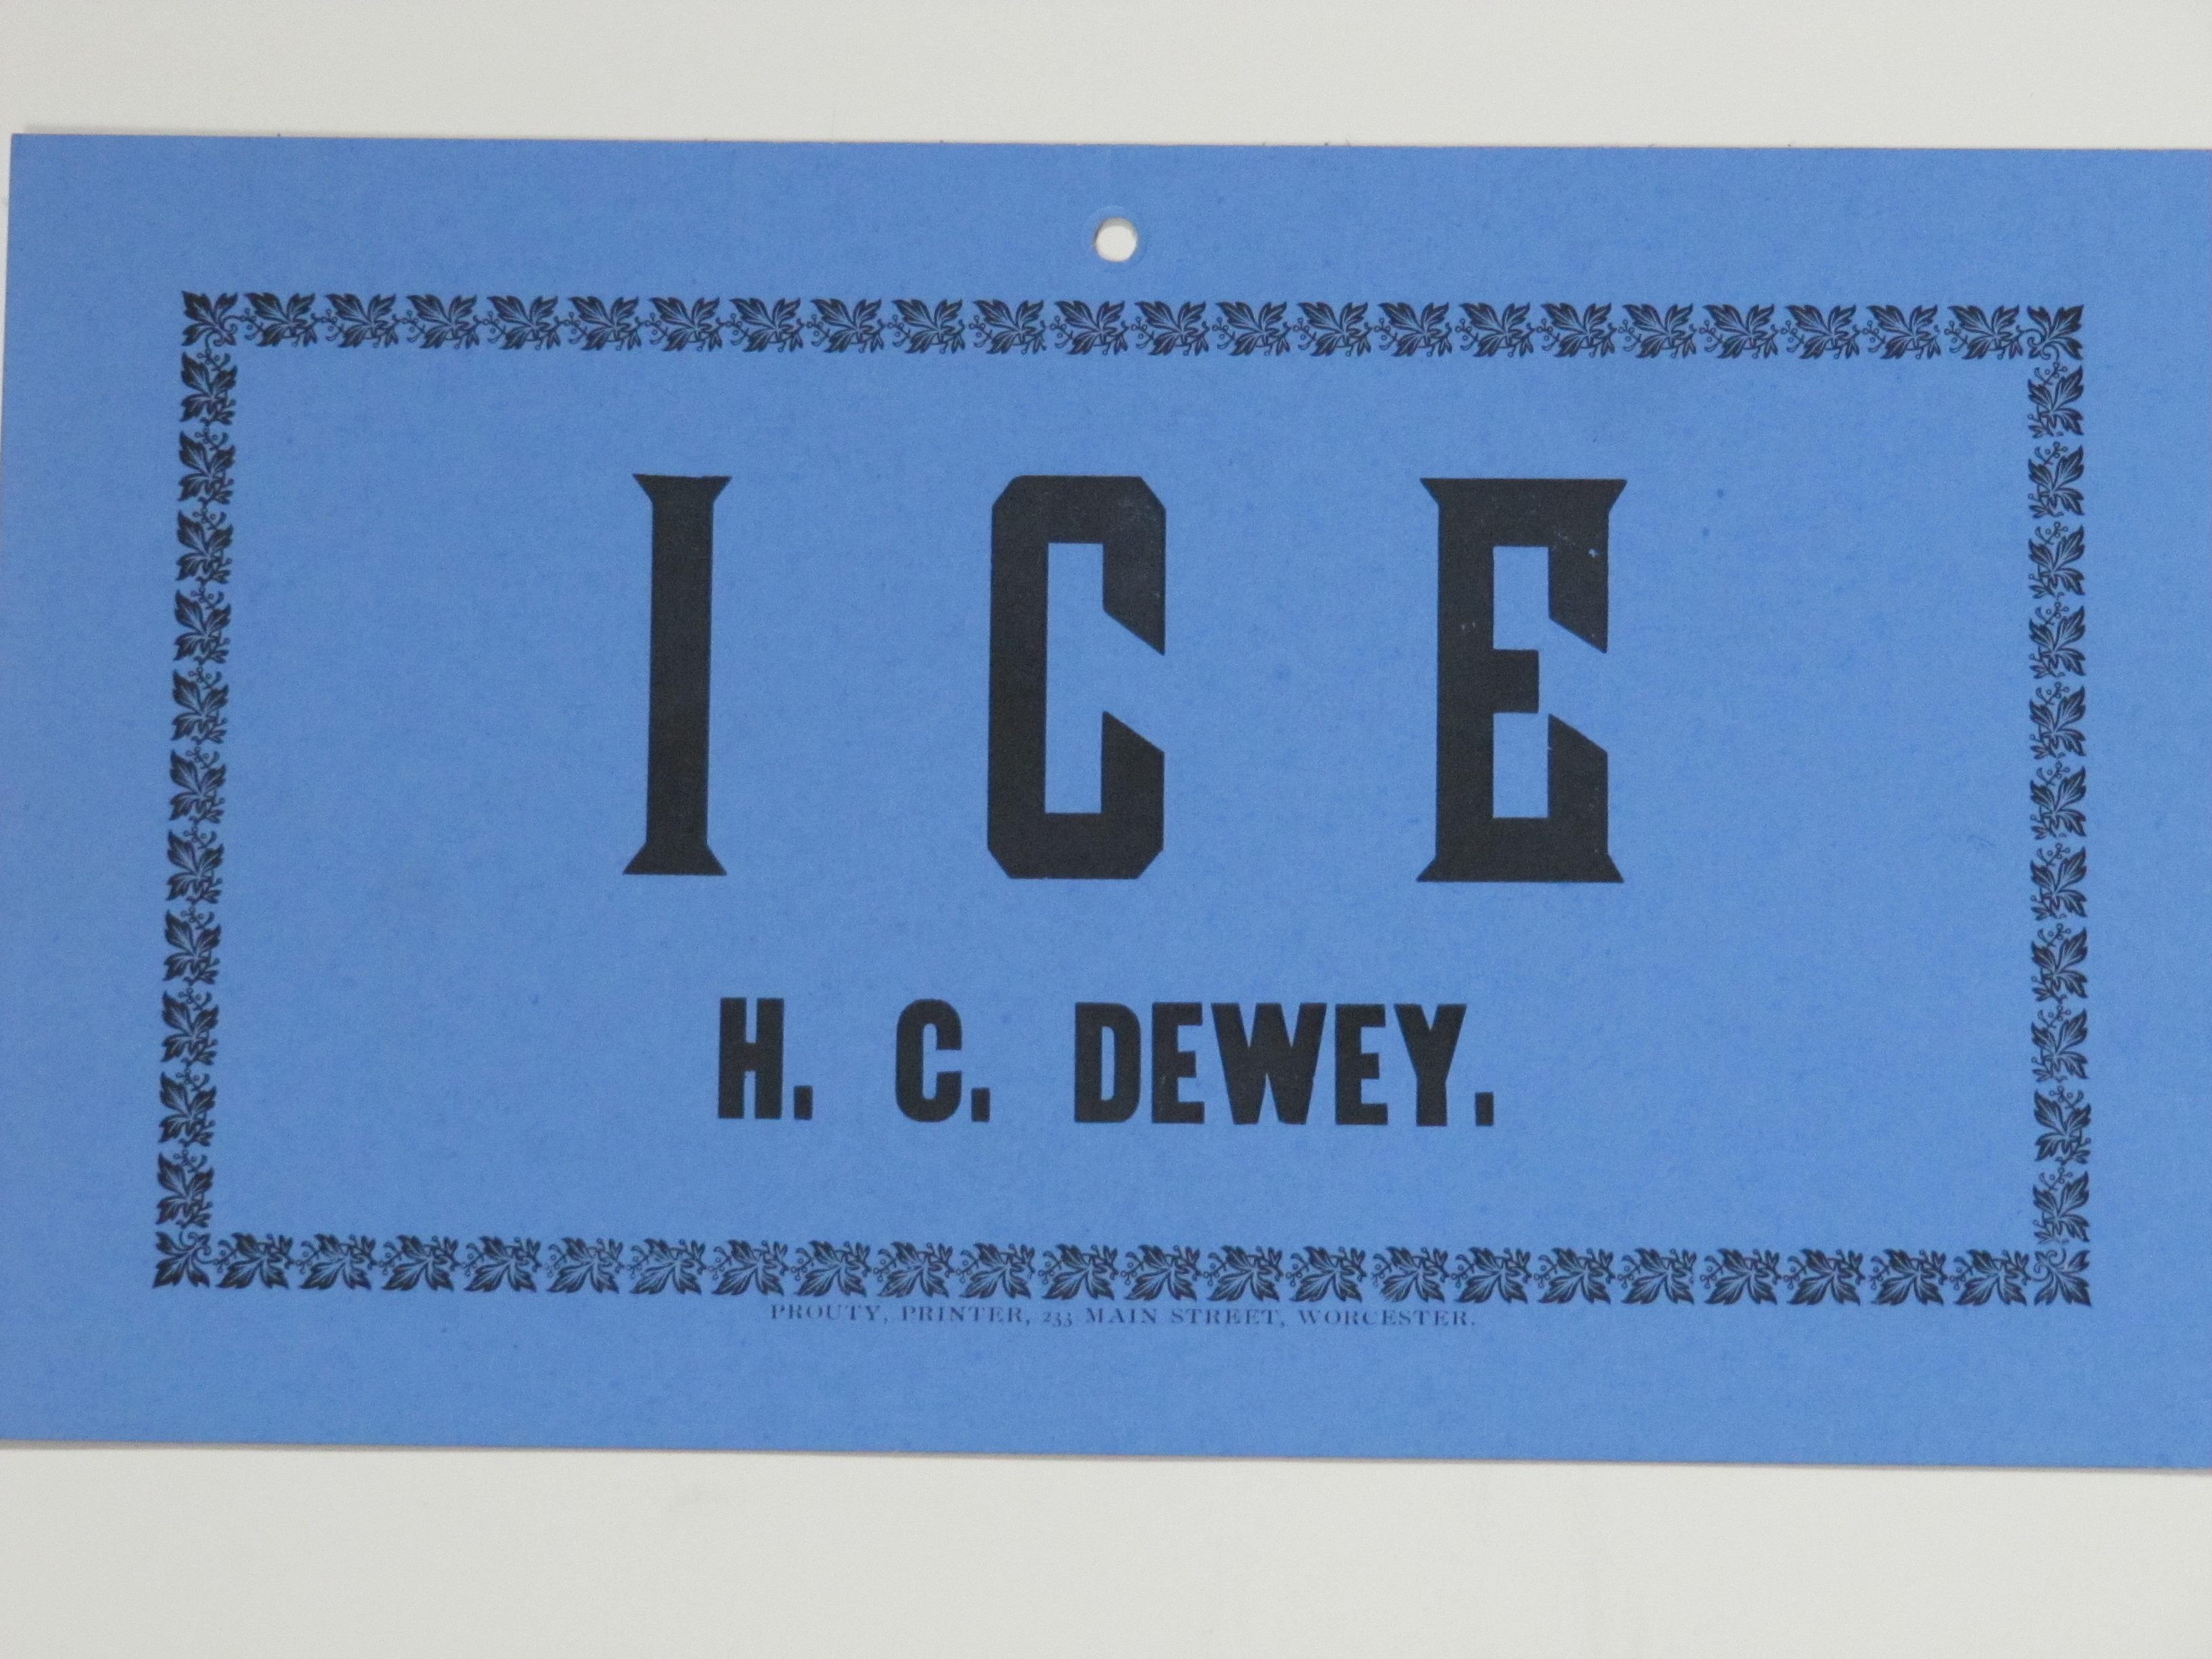 H.C.Dewey Ice